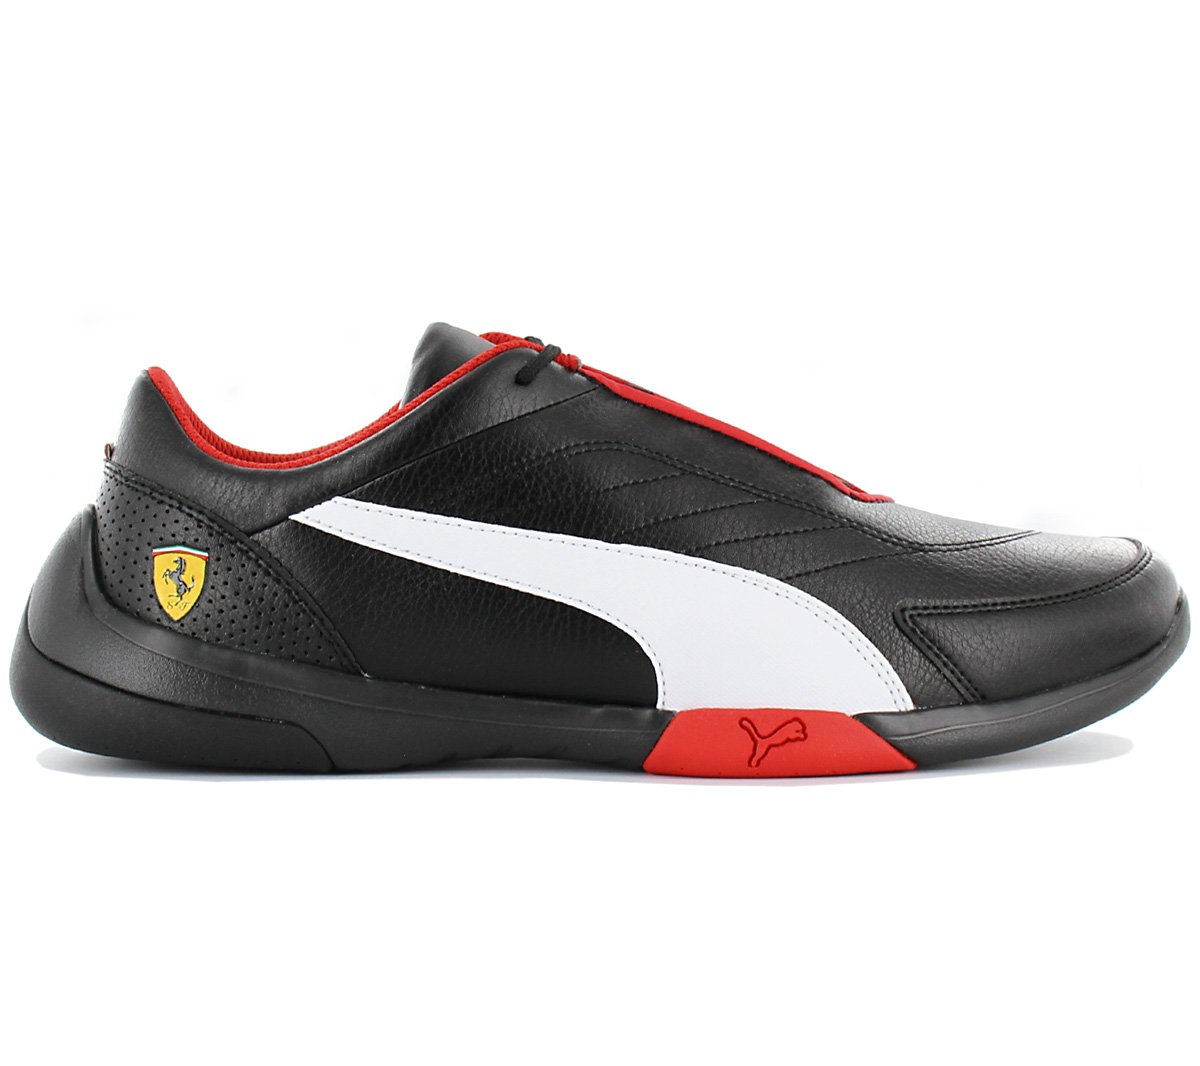 puma ferrari sf kart cat 3 herren sneaker motorsport. Black Bedroom Furniture Sets. Home Design Ideas